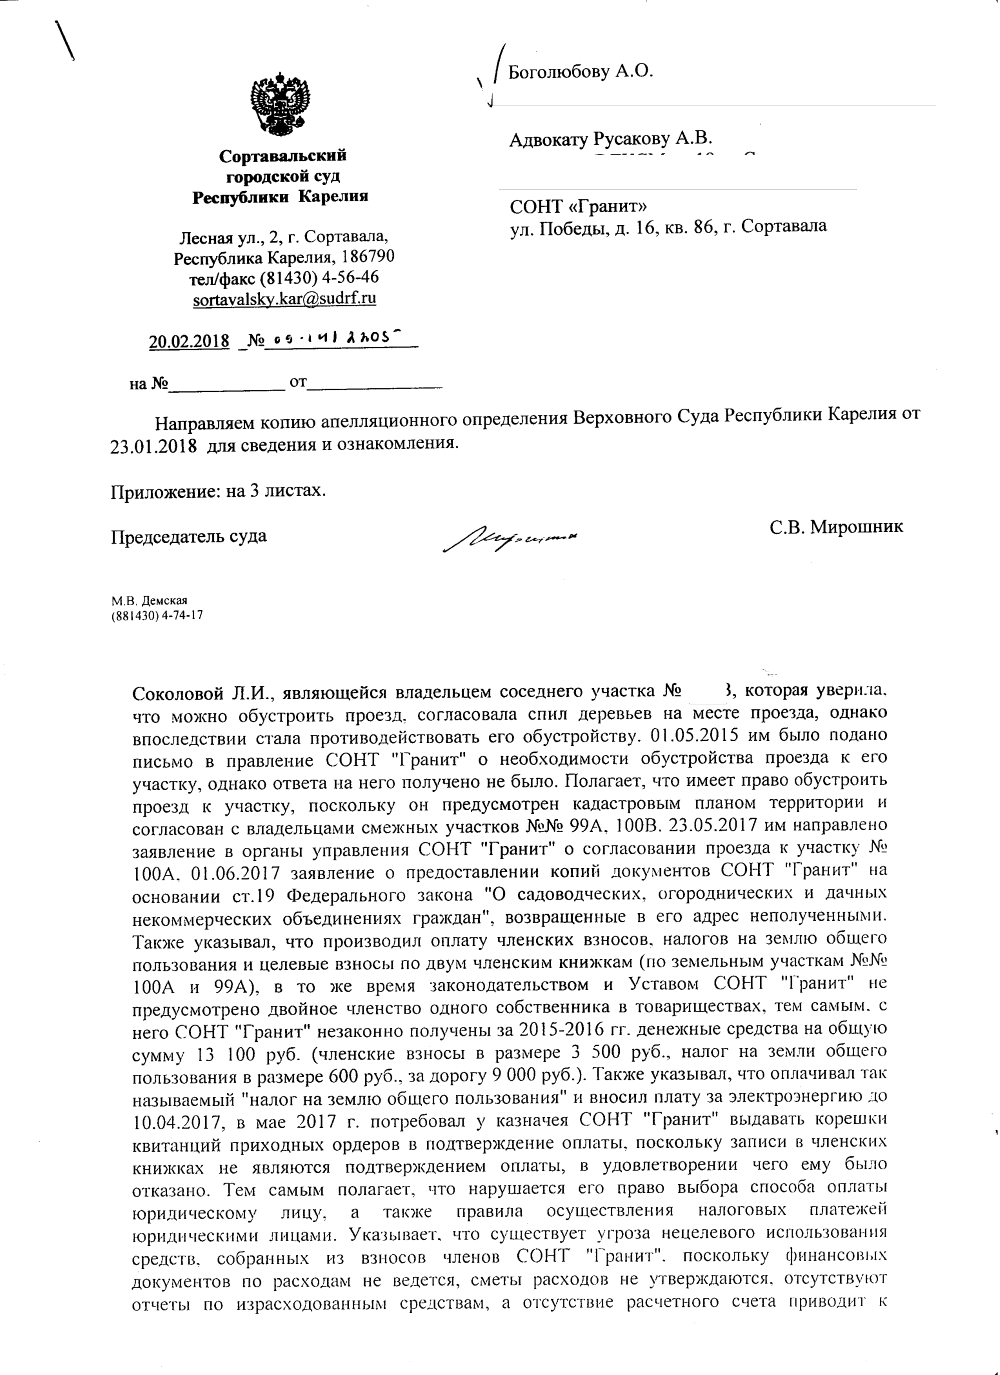 https://sontgranit.ru/forum/img/sokol/20180123-апелляционное-определение-вс-1.png